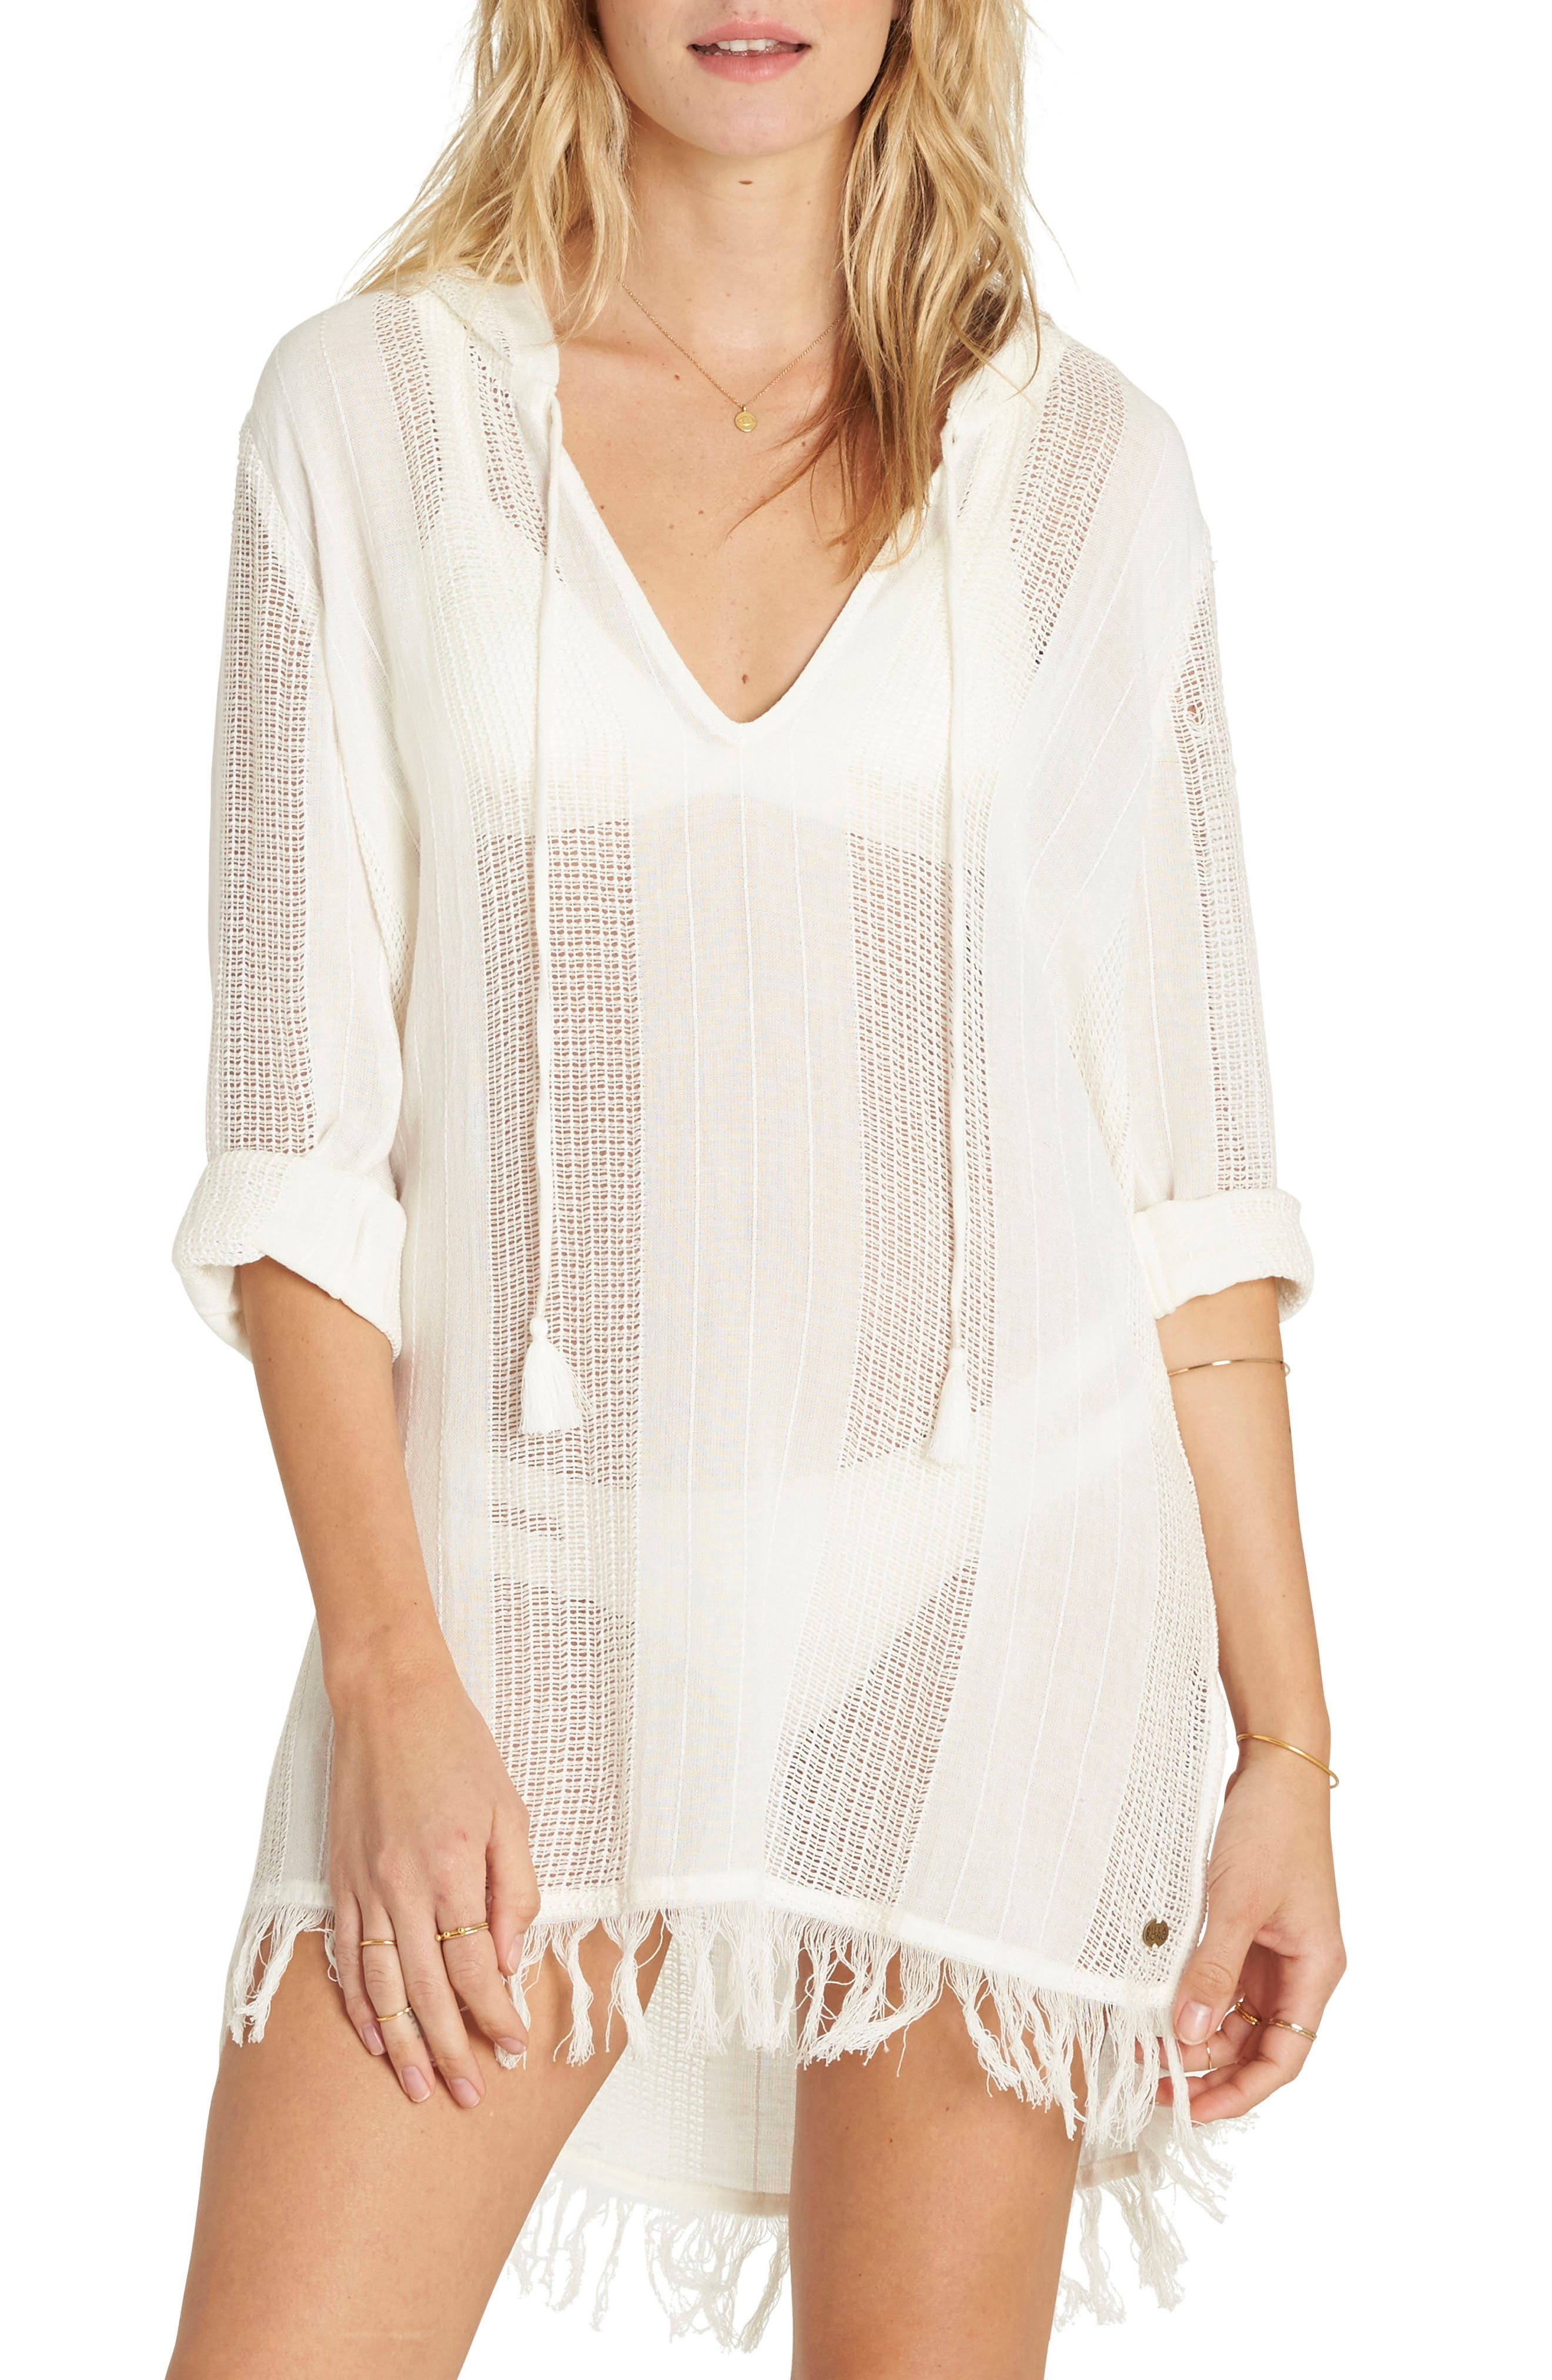 Billabong Babe Side Cover-Up Dress